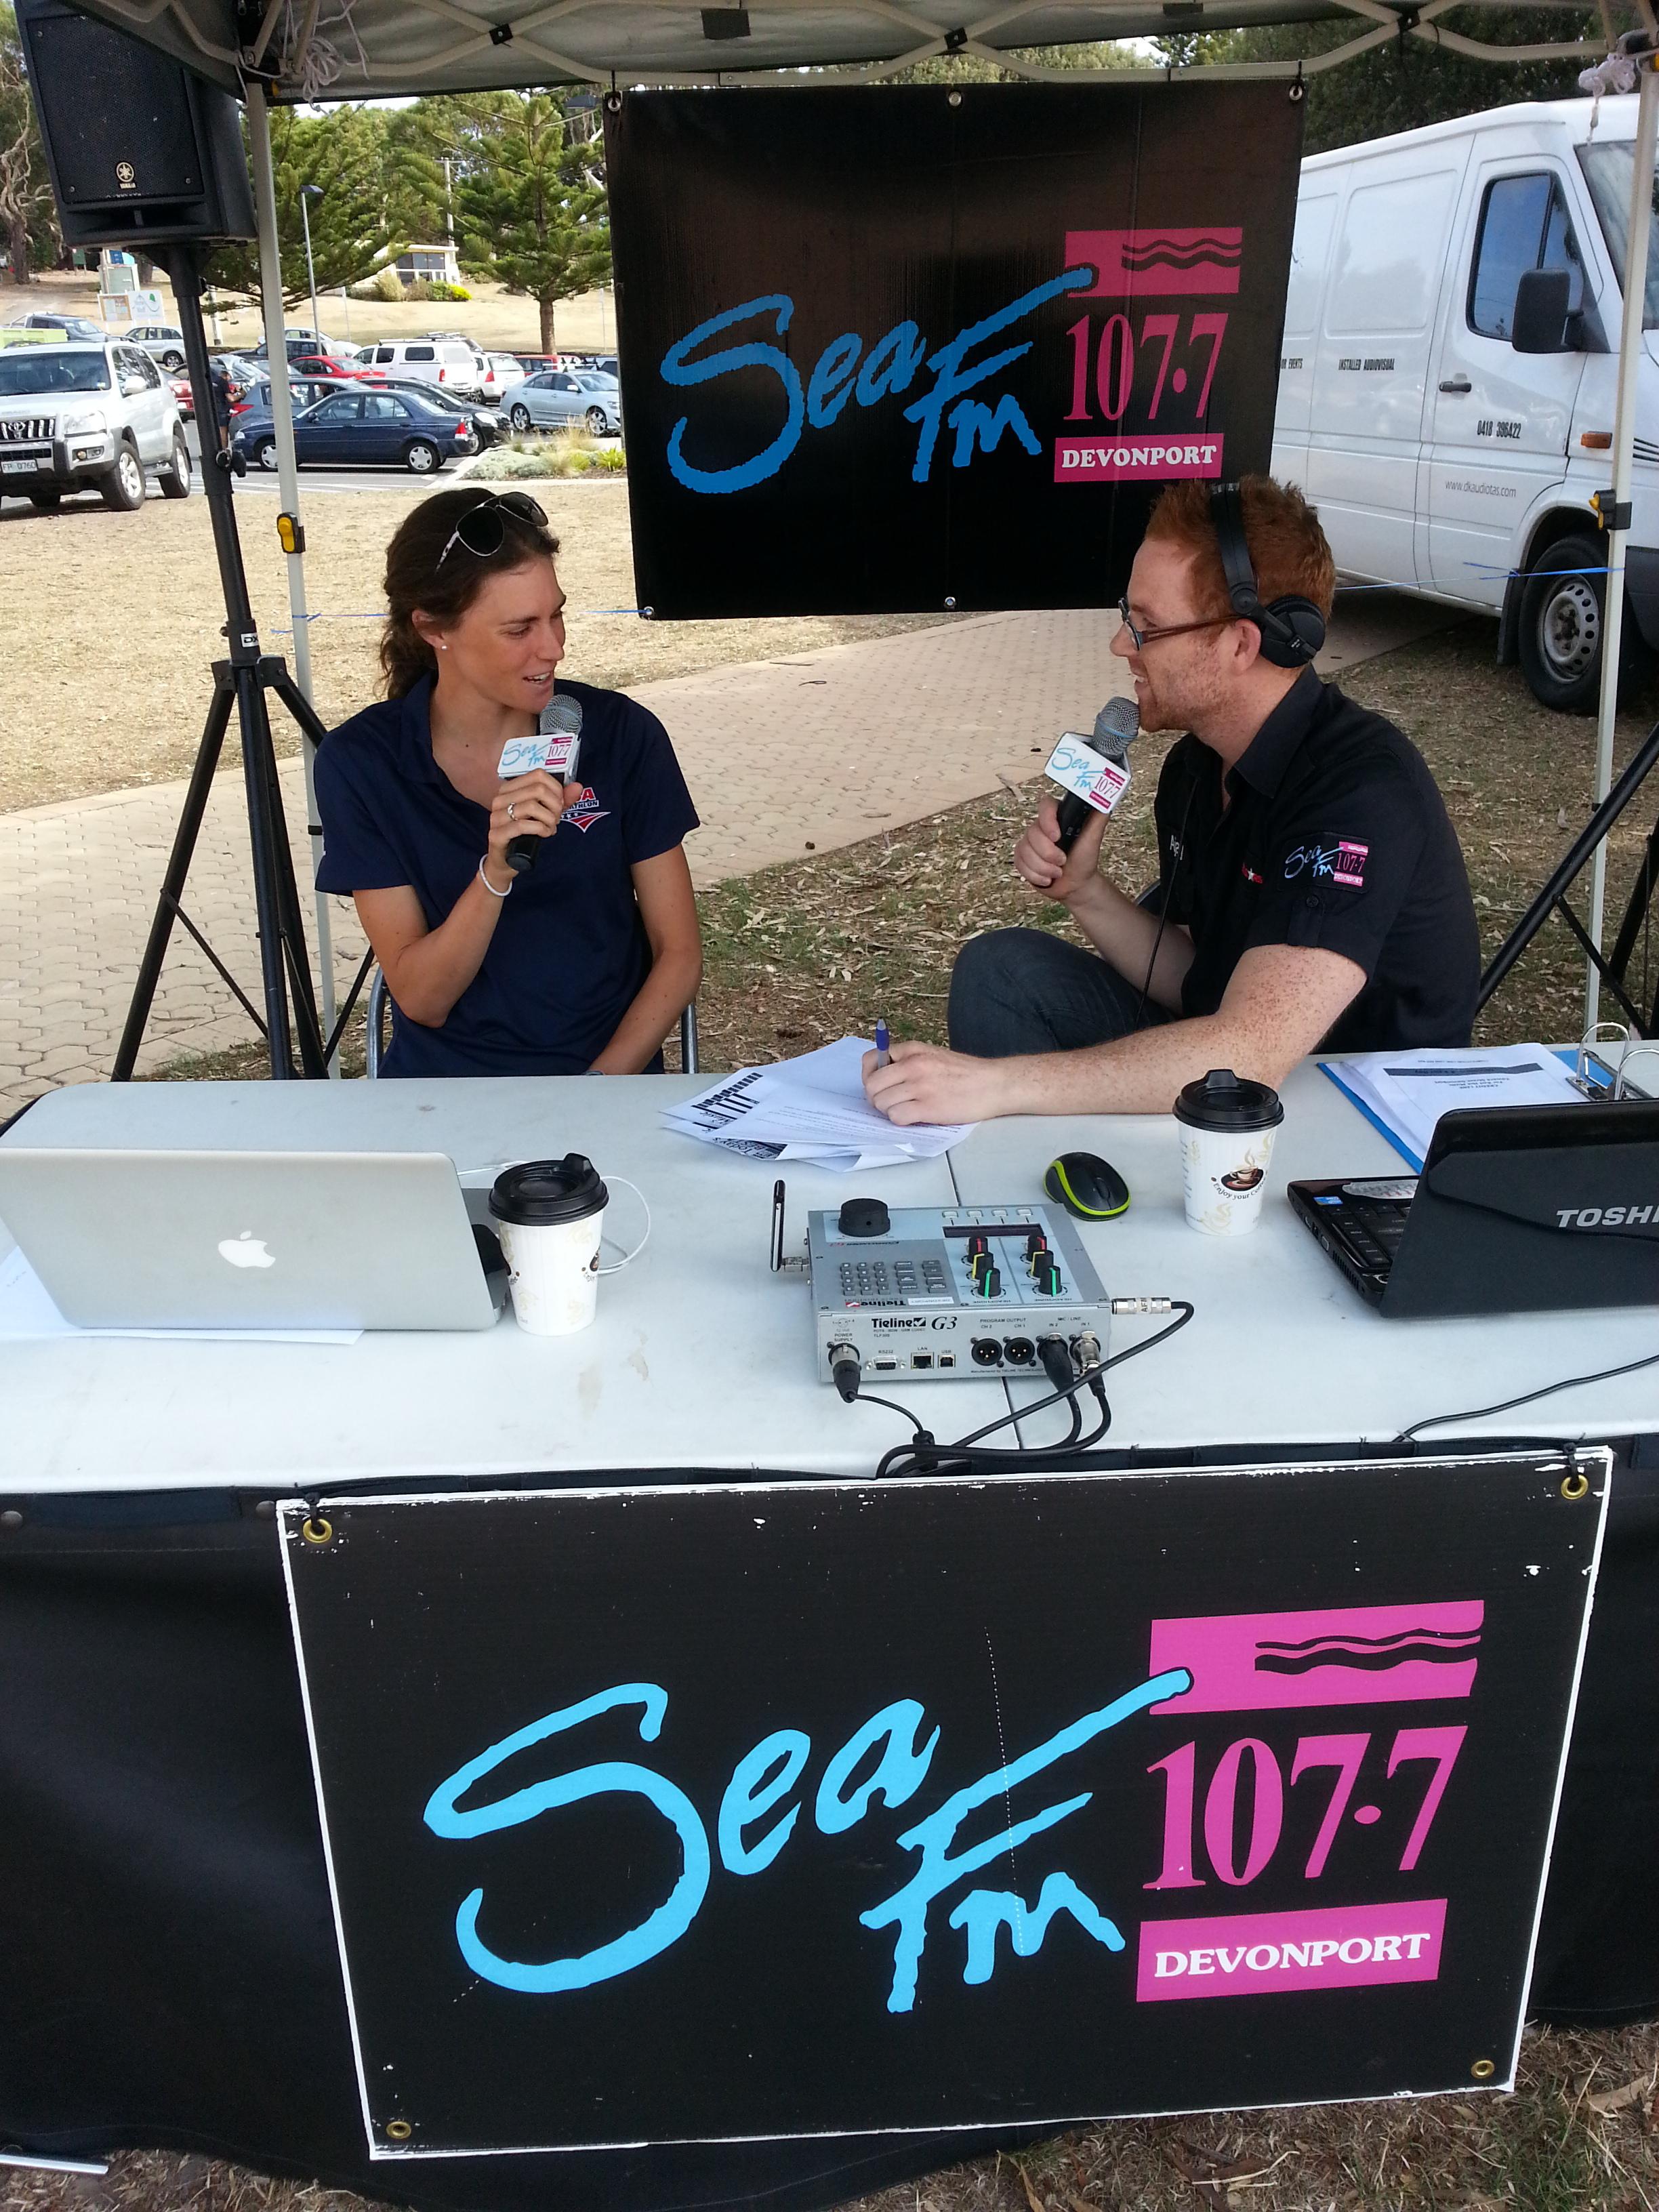 Interview in Devonport 2013